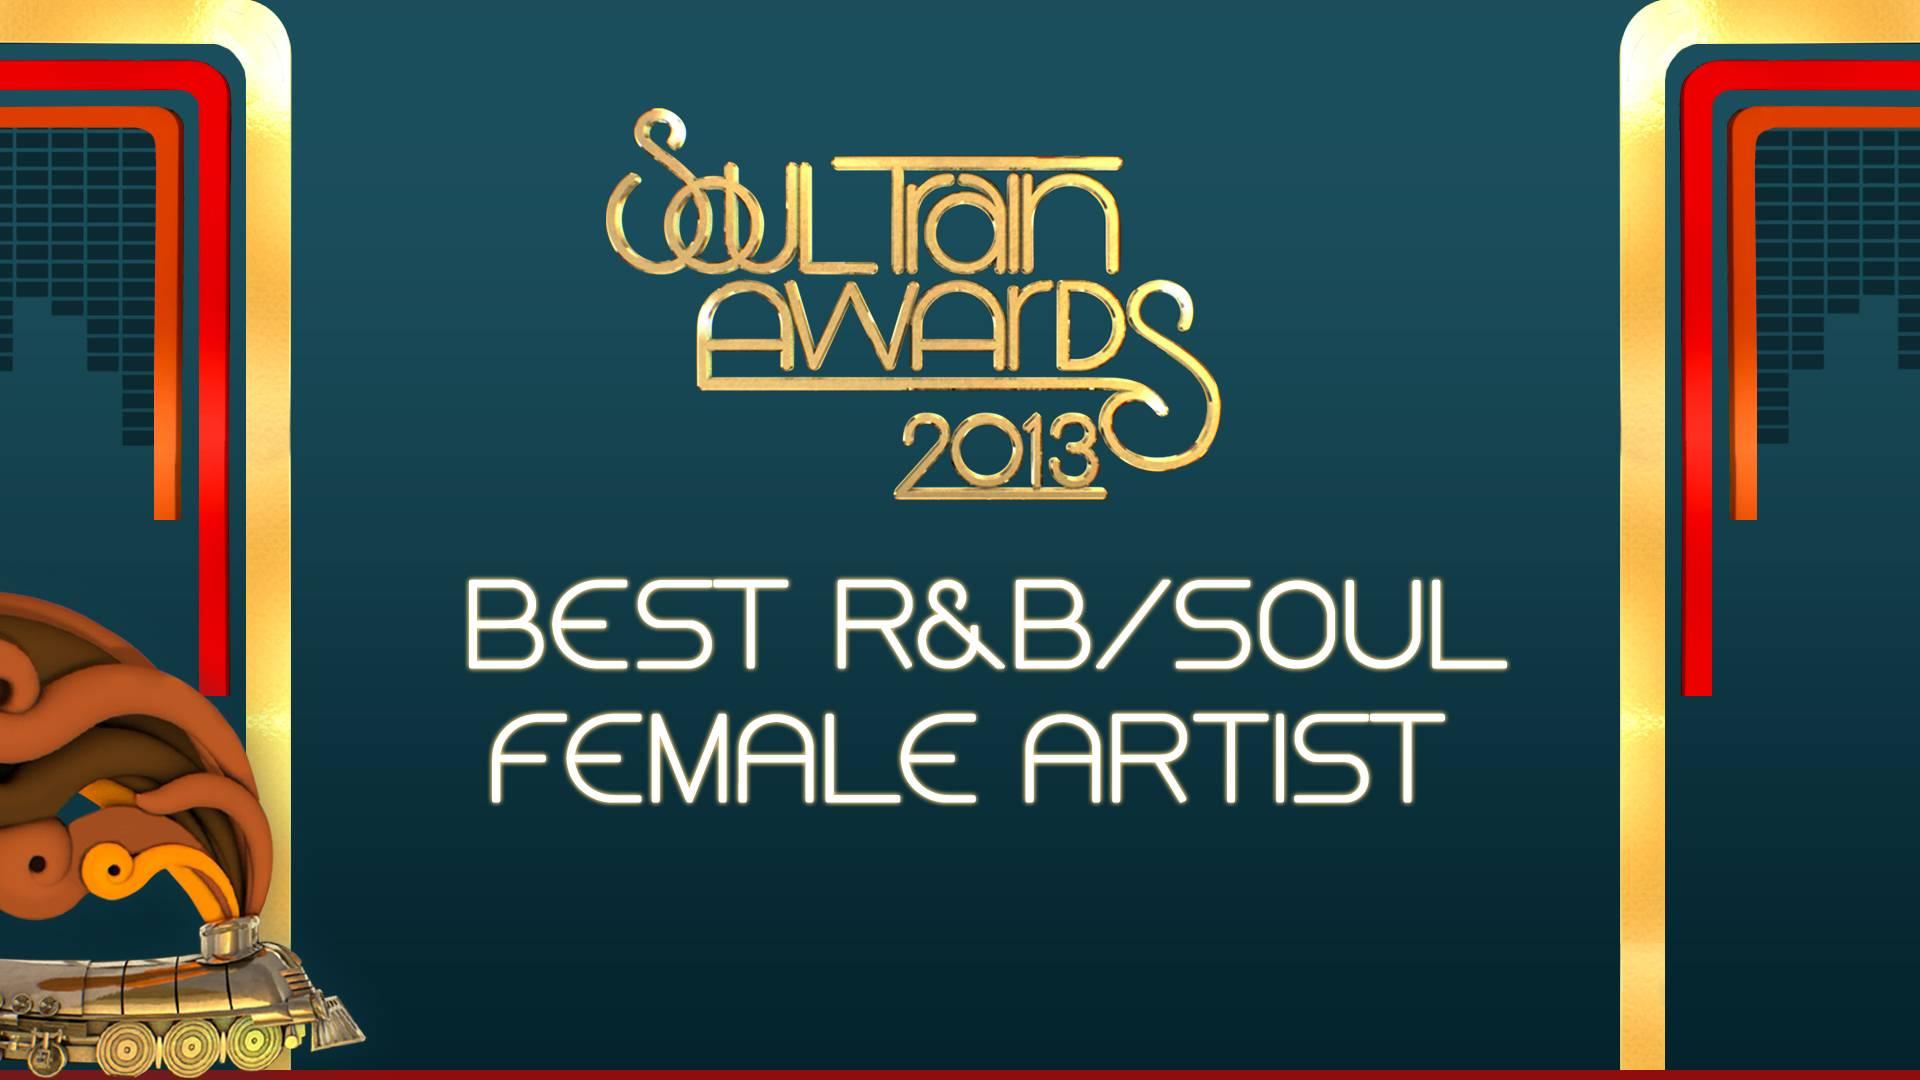 Best R&B/Soul Female Artist